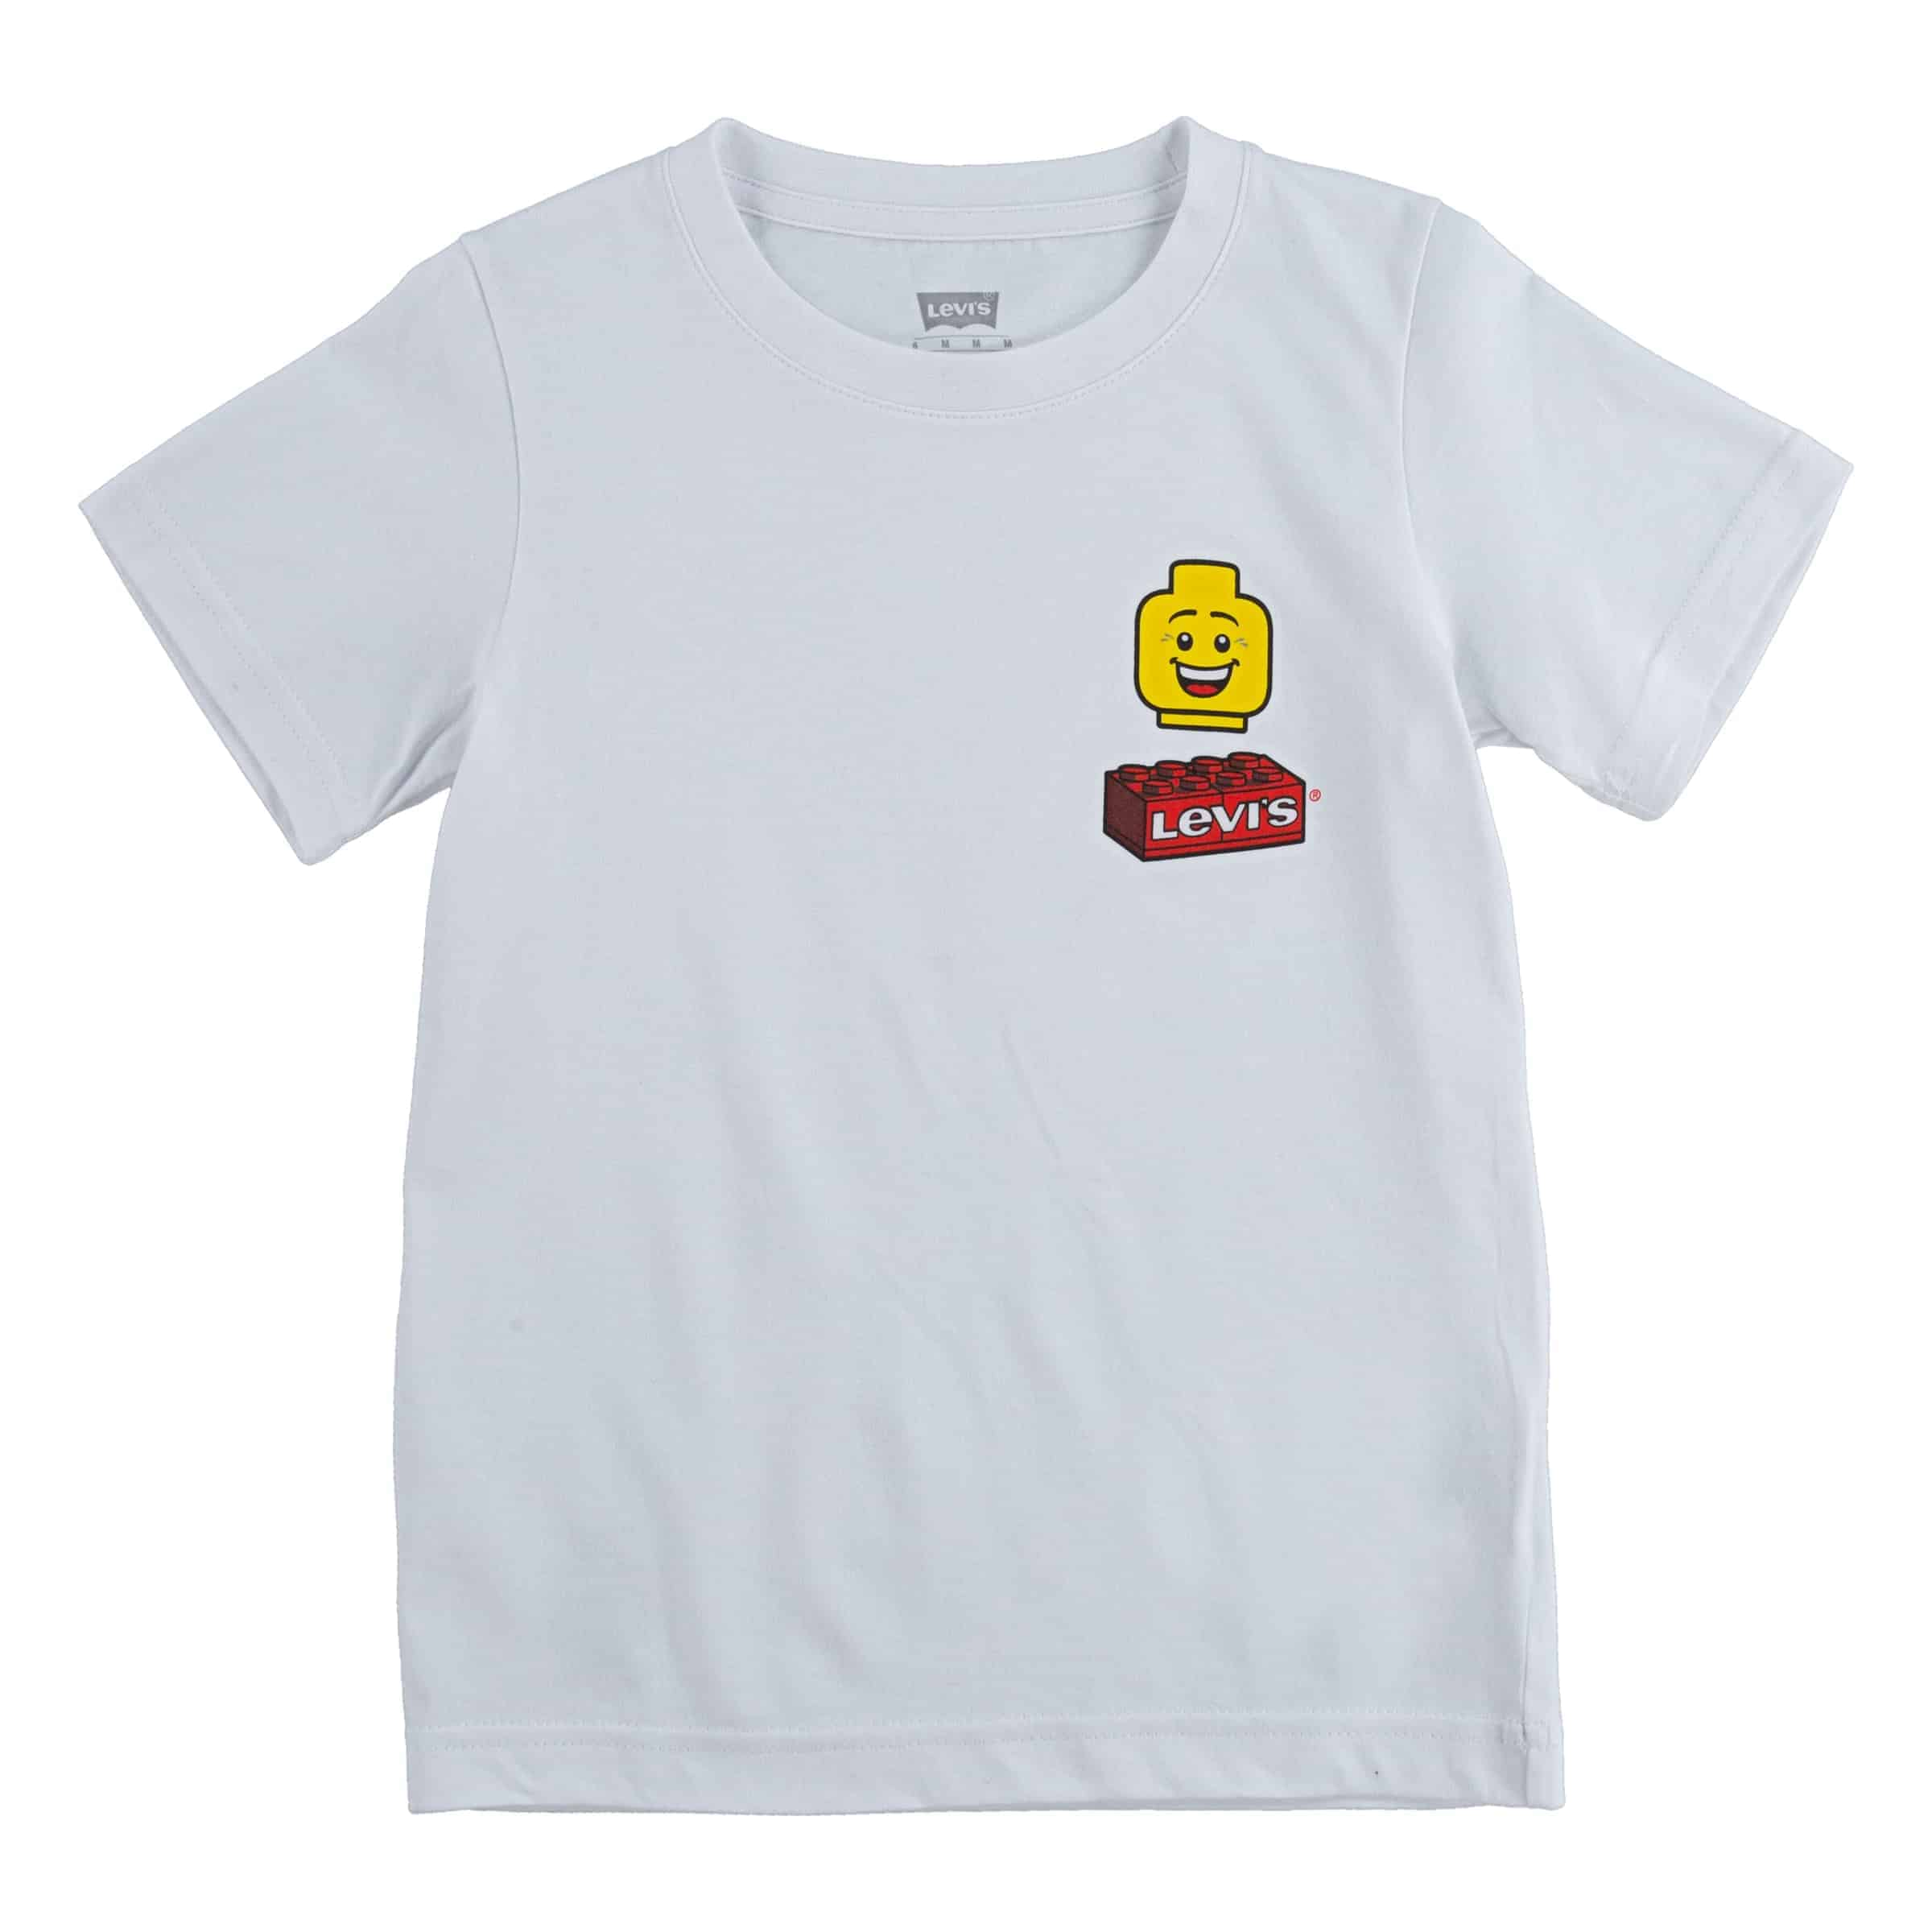 levis x lego 5006419 logo t shirt 8 14